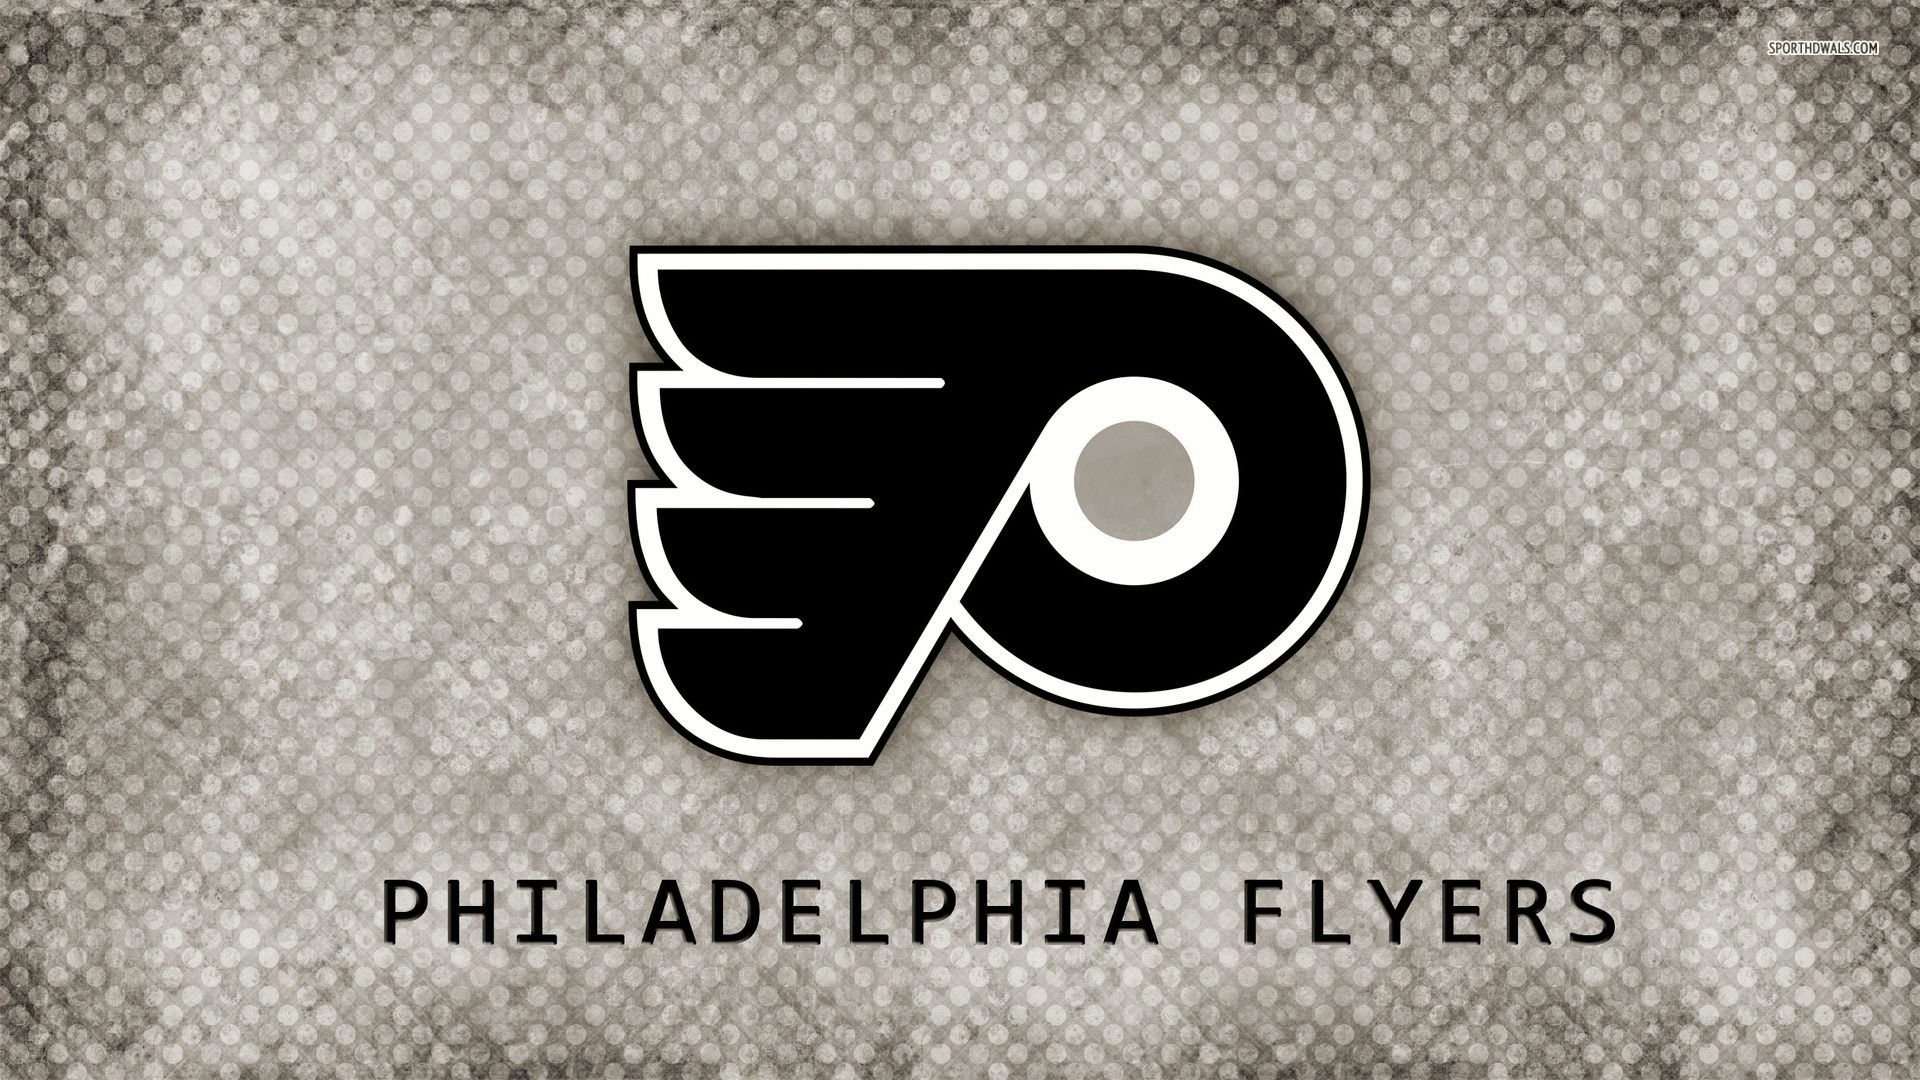 PHILADELPHIA FLYERS nhl hockey (26) wallpaper     344867    WallpaperUP